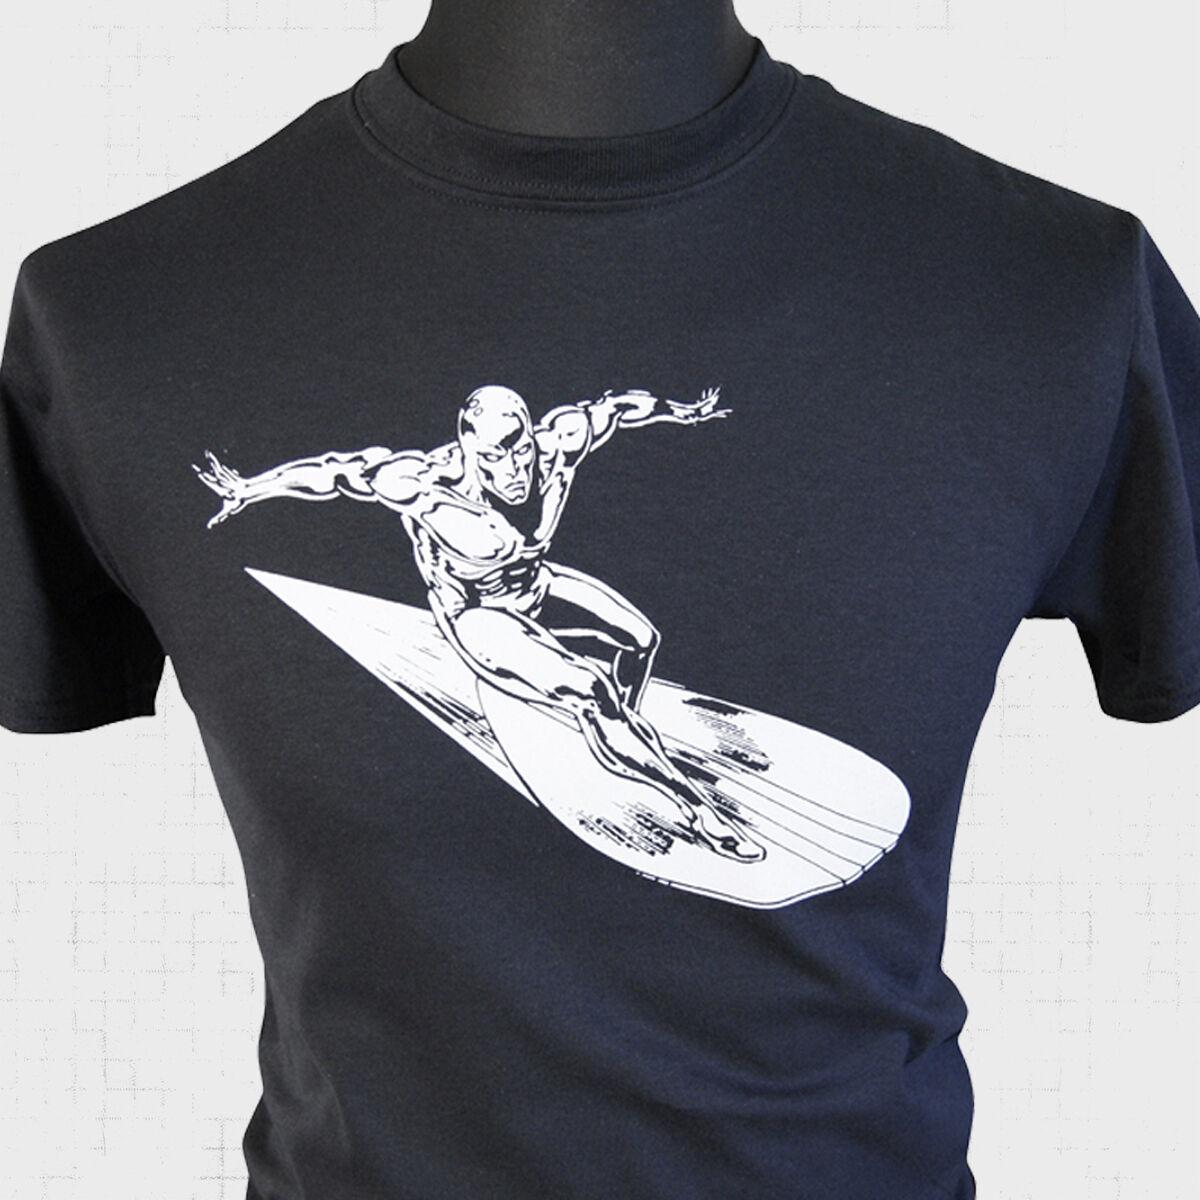 The silver surfer t shirt fantastic four retro comic super for Retro superhero t shirts